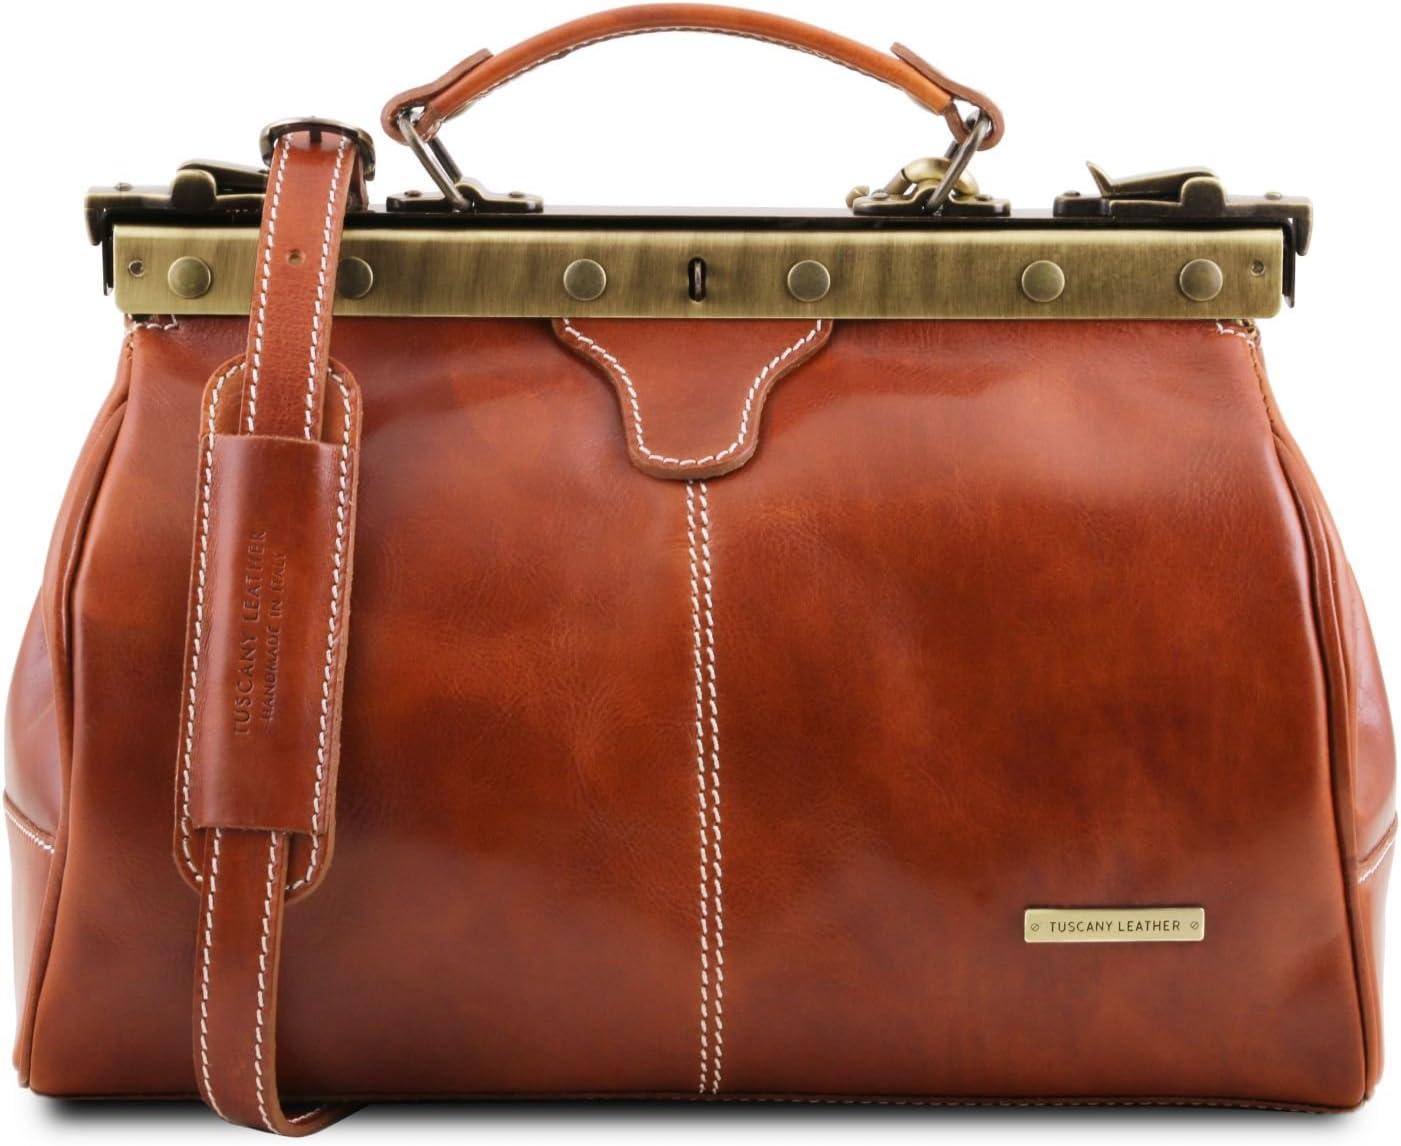 Tuscany Leather TL10038//3 Doctor gladstone leather bag Honey Michelangelo